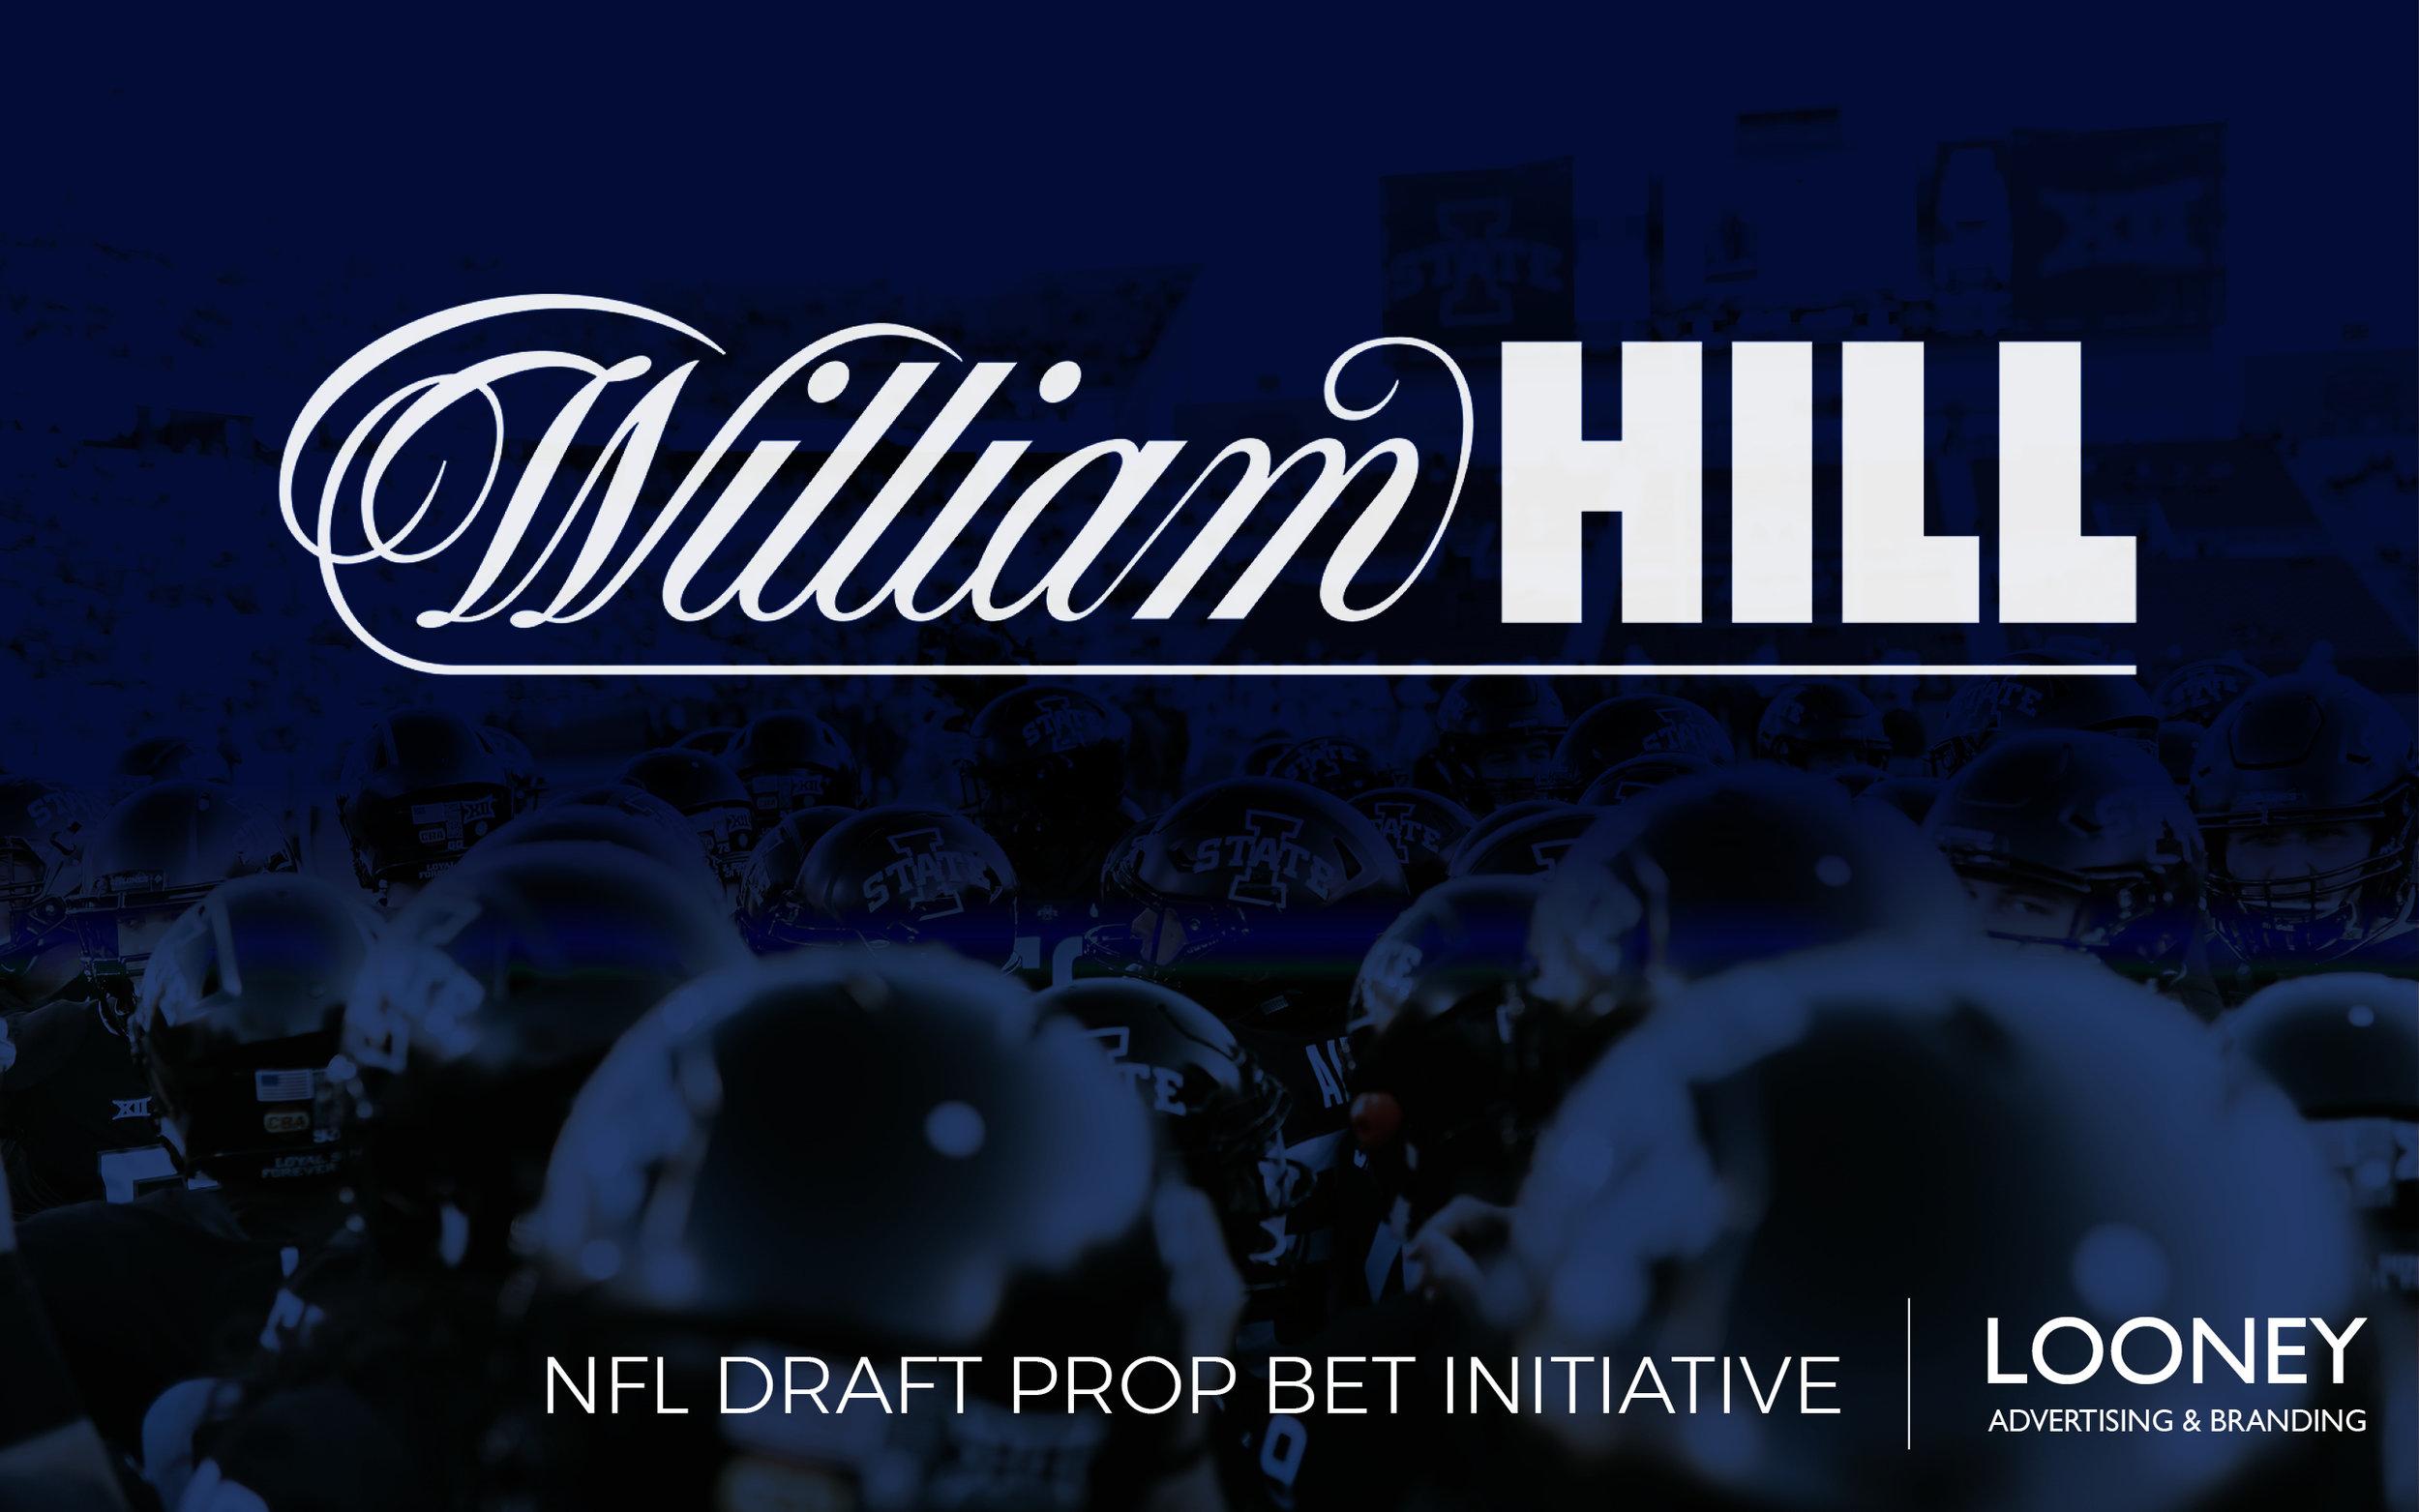 William Hill_NFL Draft Prop Bet Initiative 2019.jpg